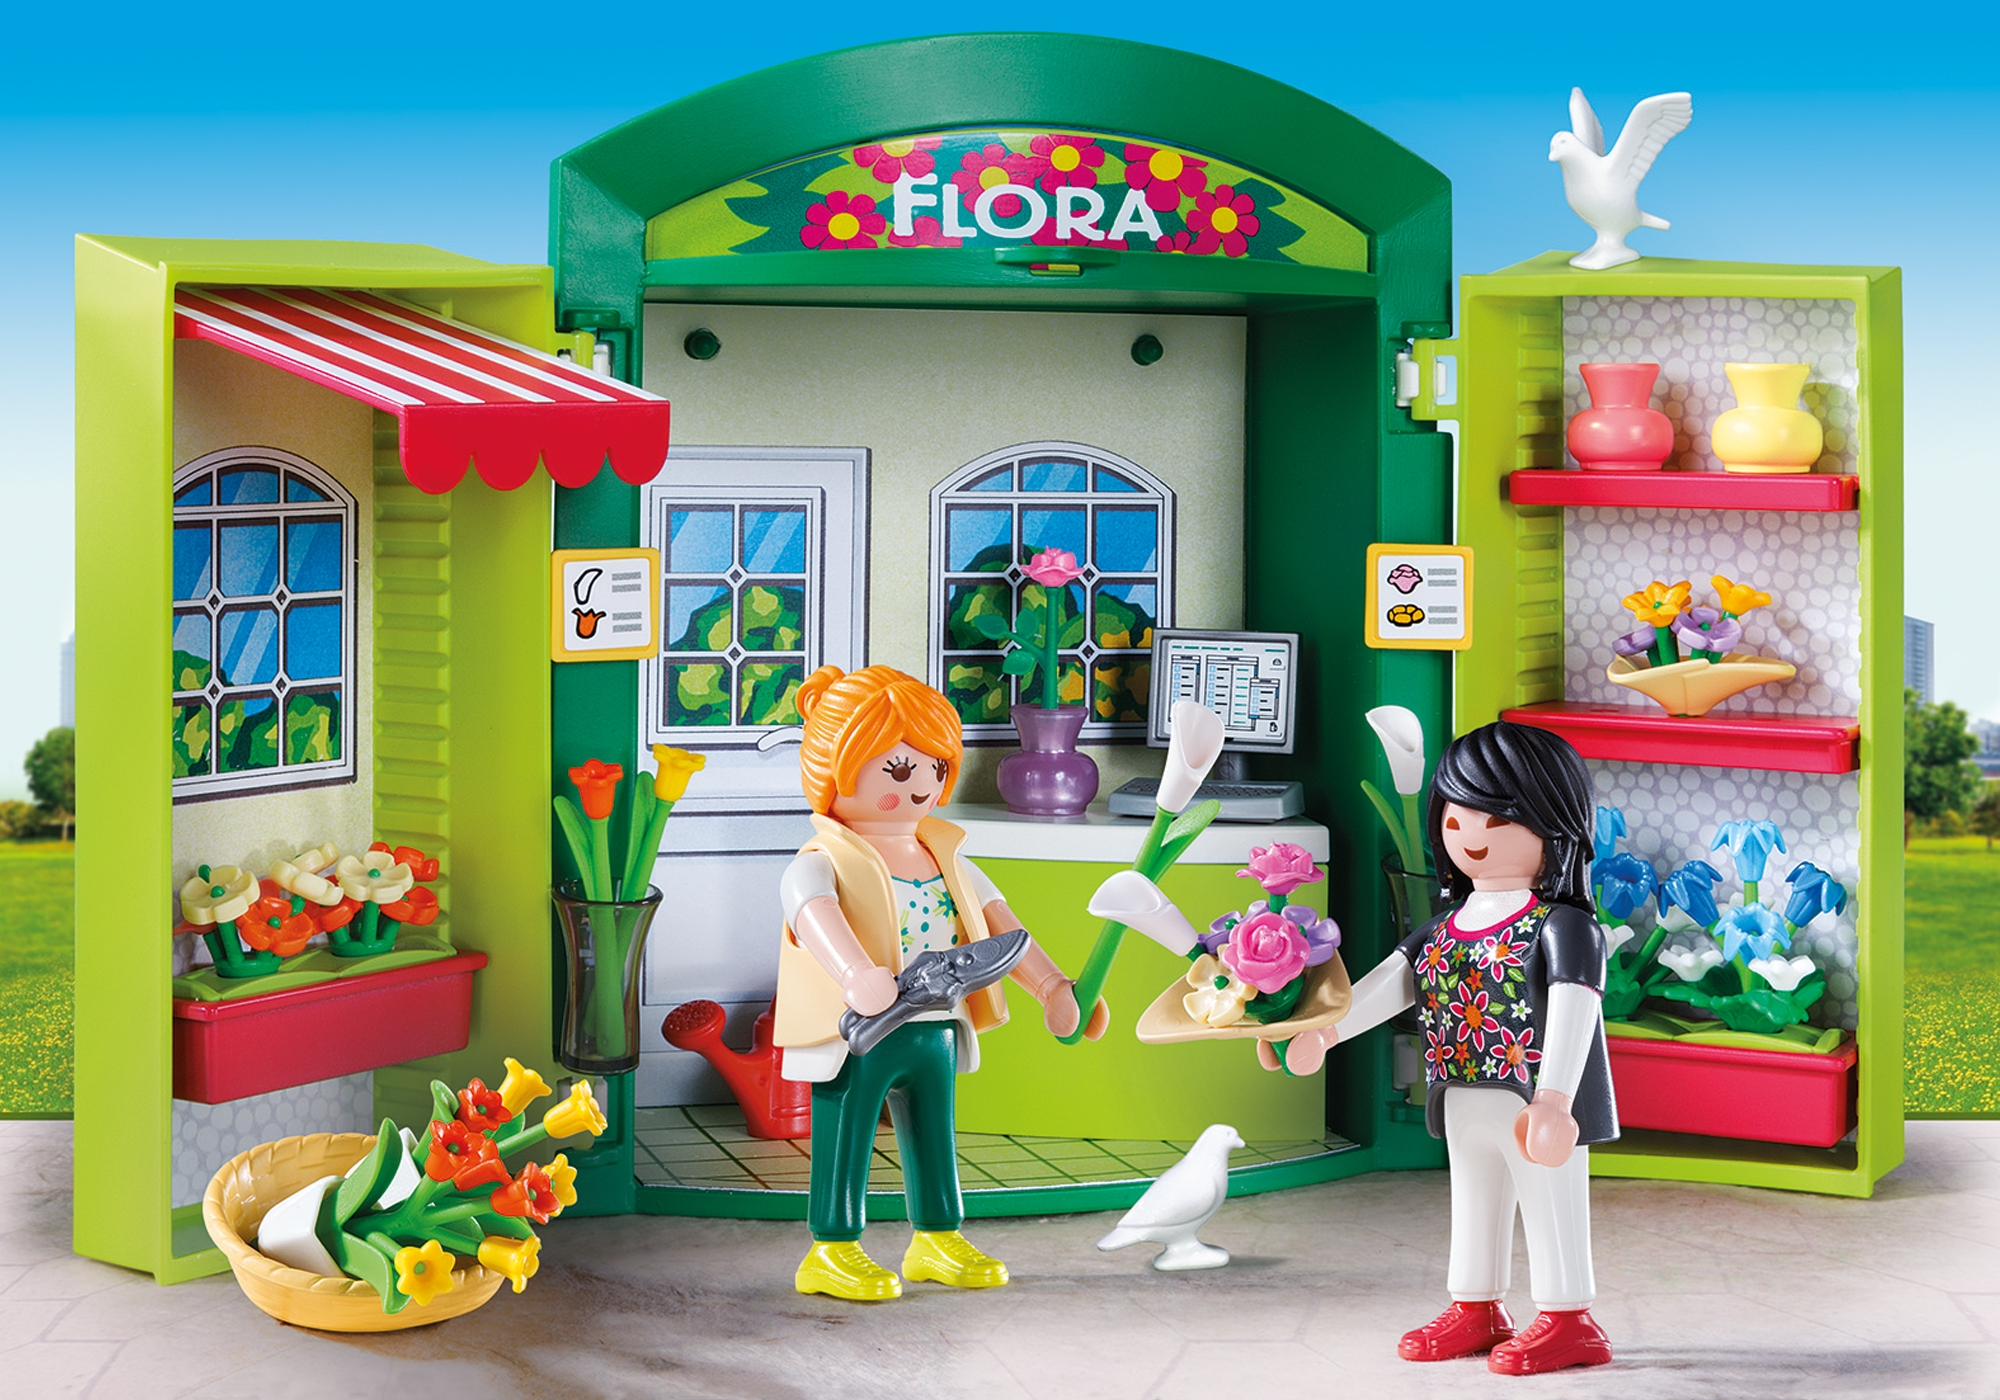 Flower Shop Play Box